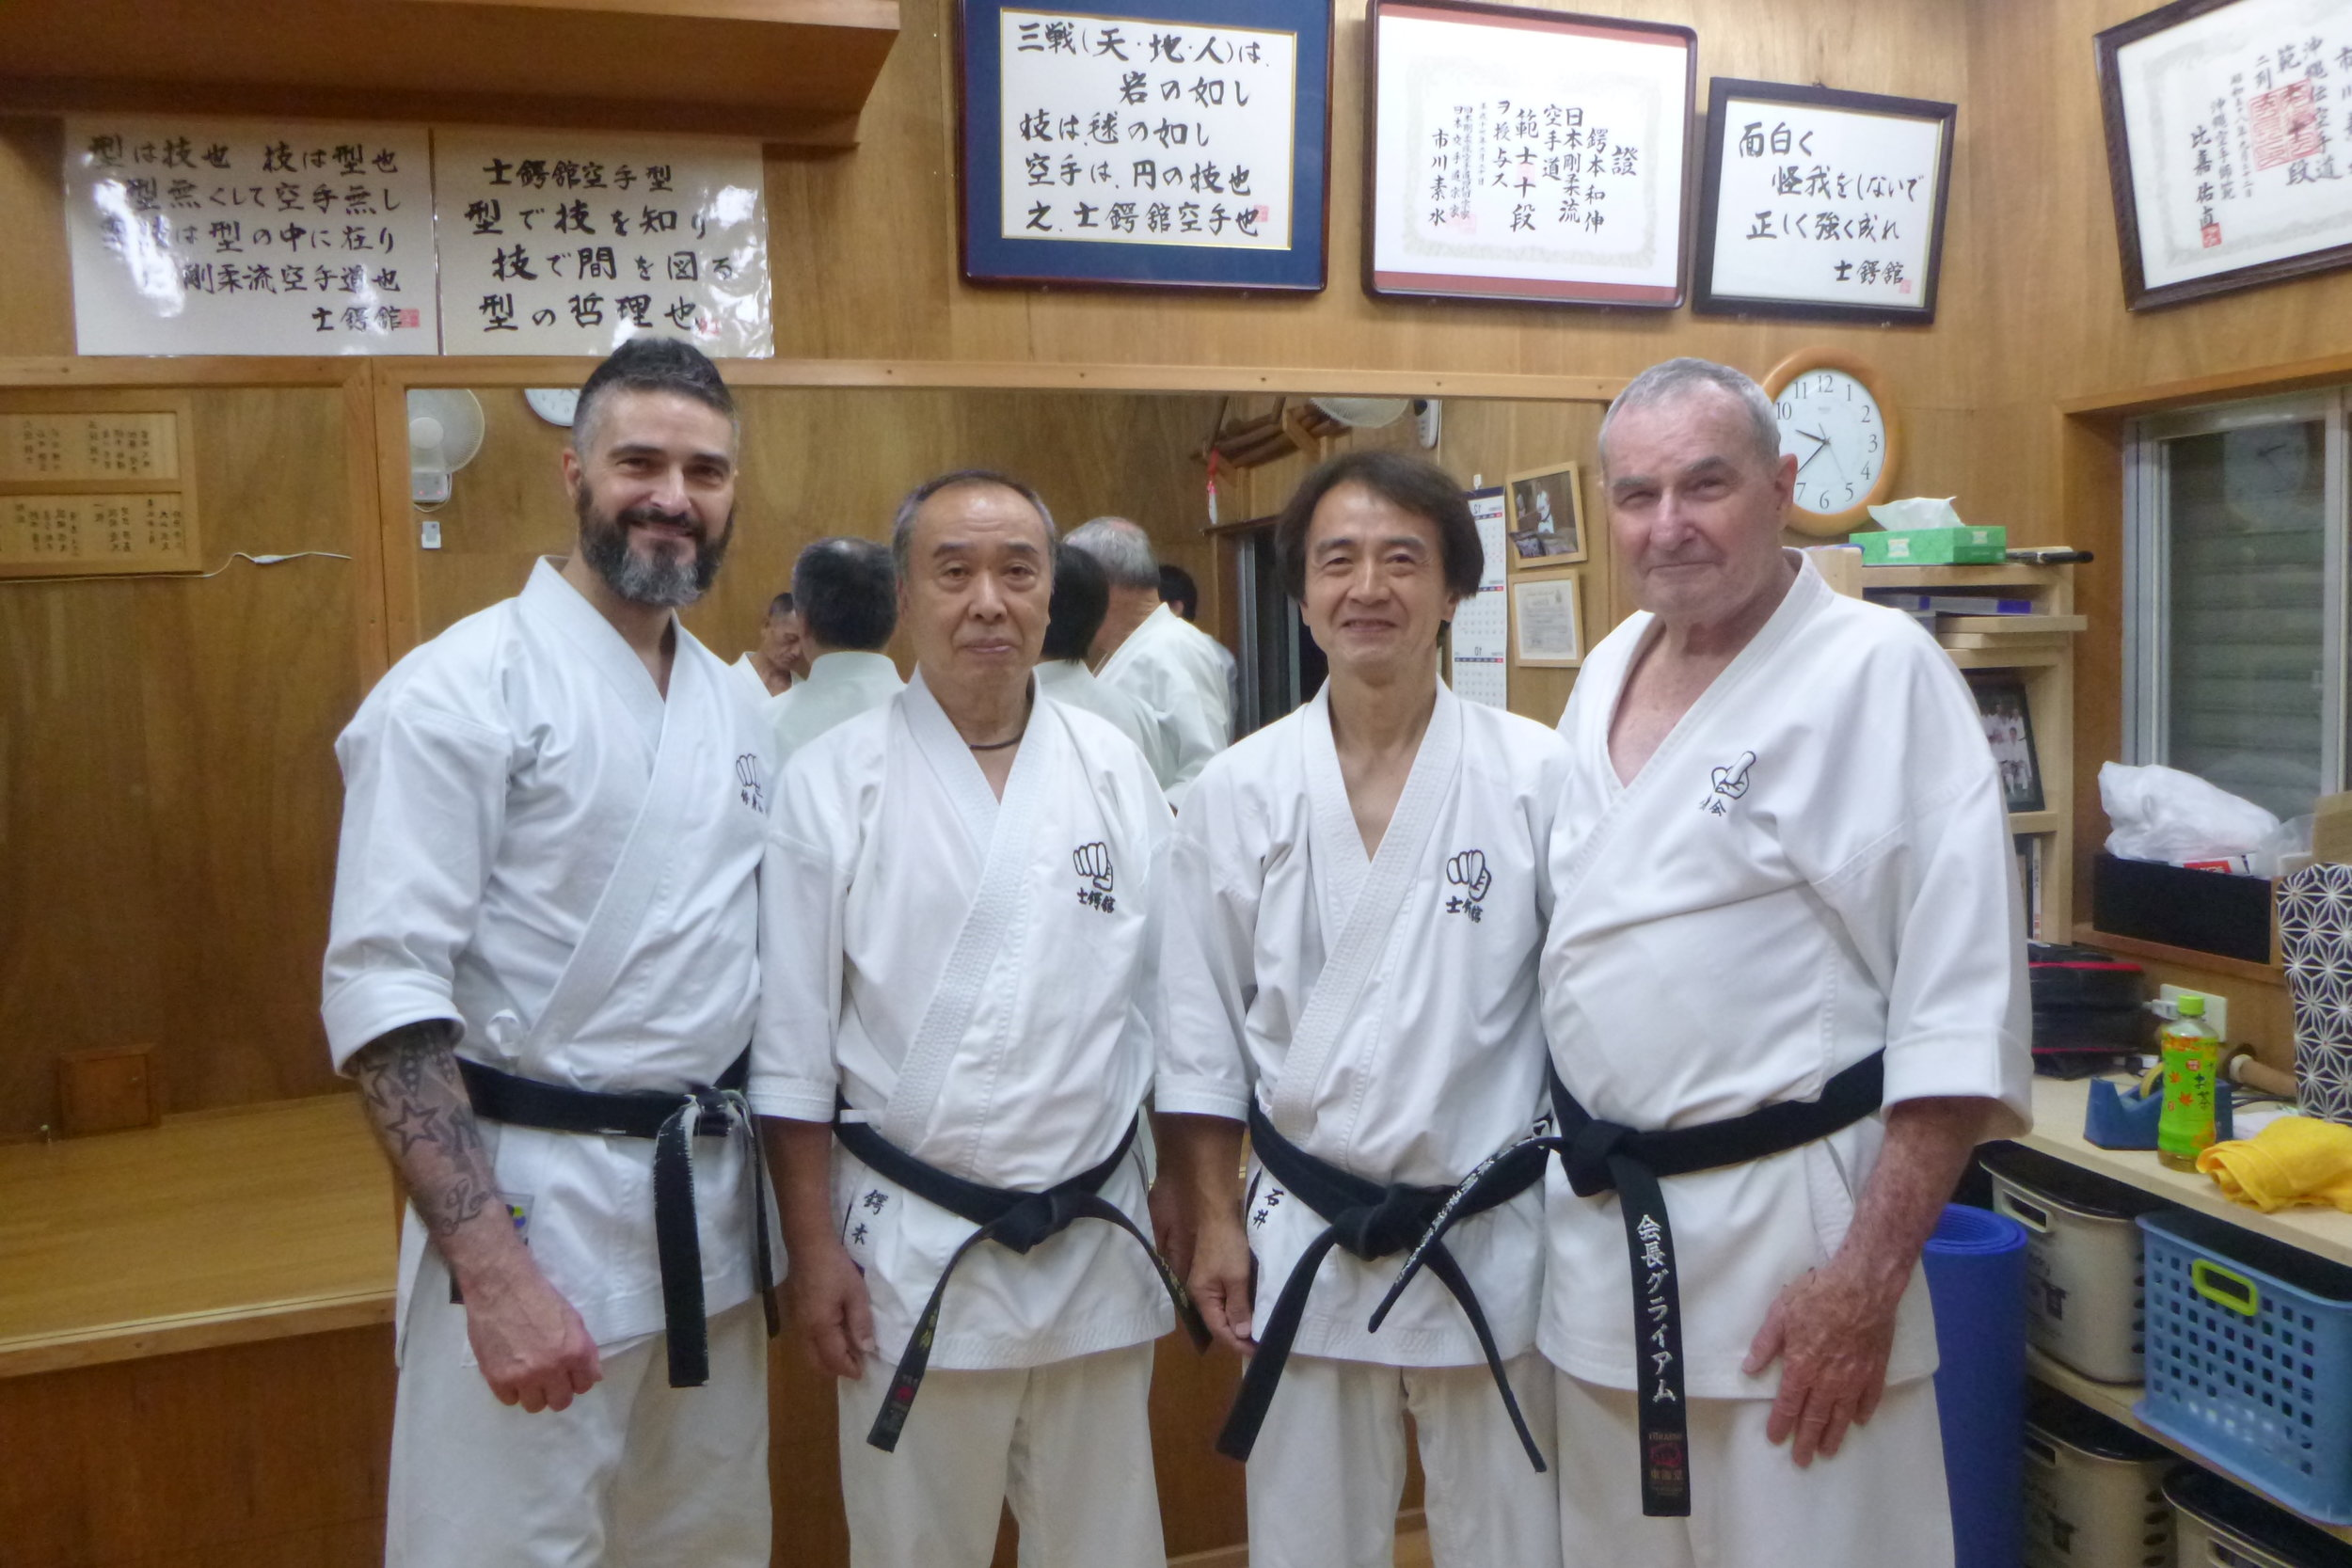 This pic shows sensei's Lincoln and Graeme with Tsubamoto Sensei and Ishii Sensei, in the Shigaku Kan dojo, Tokyo, in October, 2018.